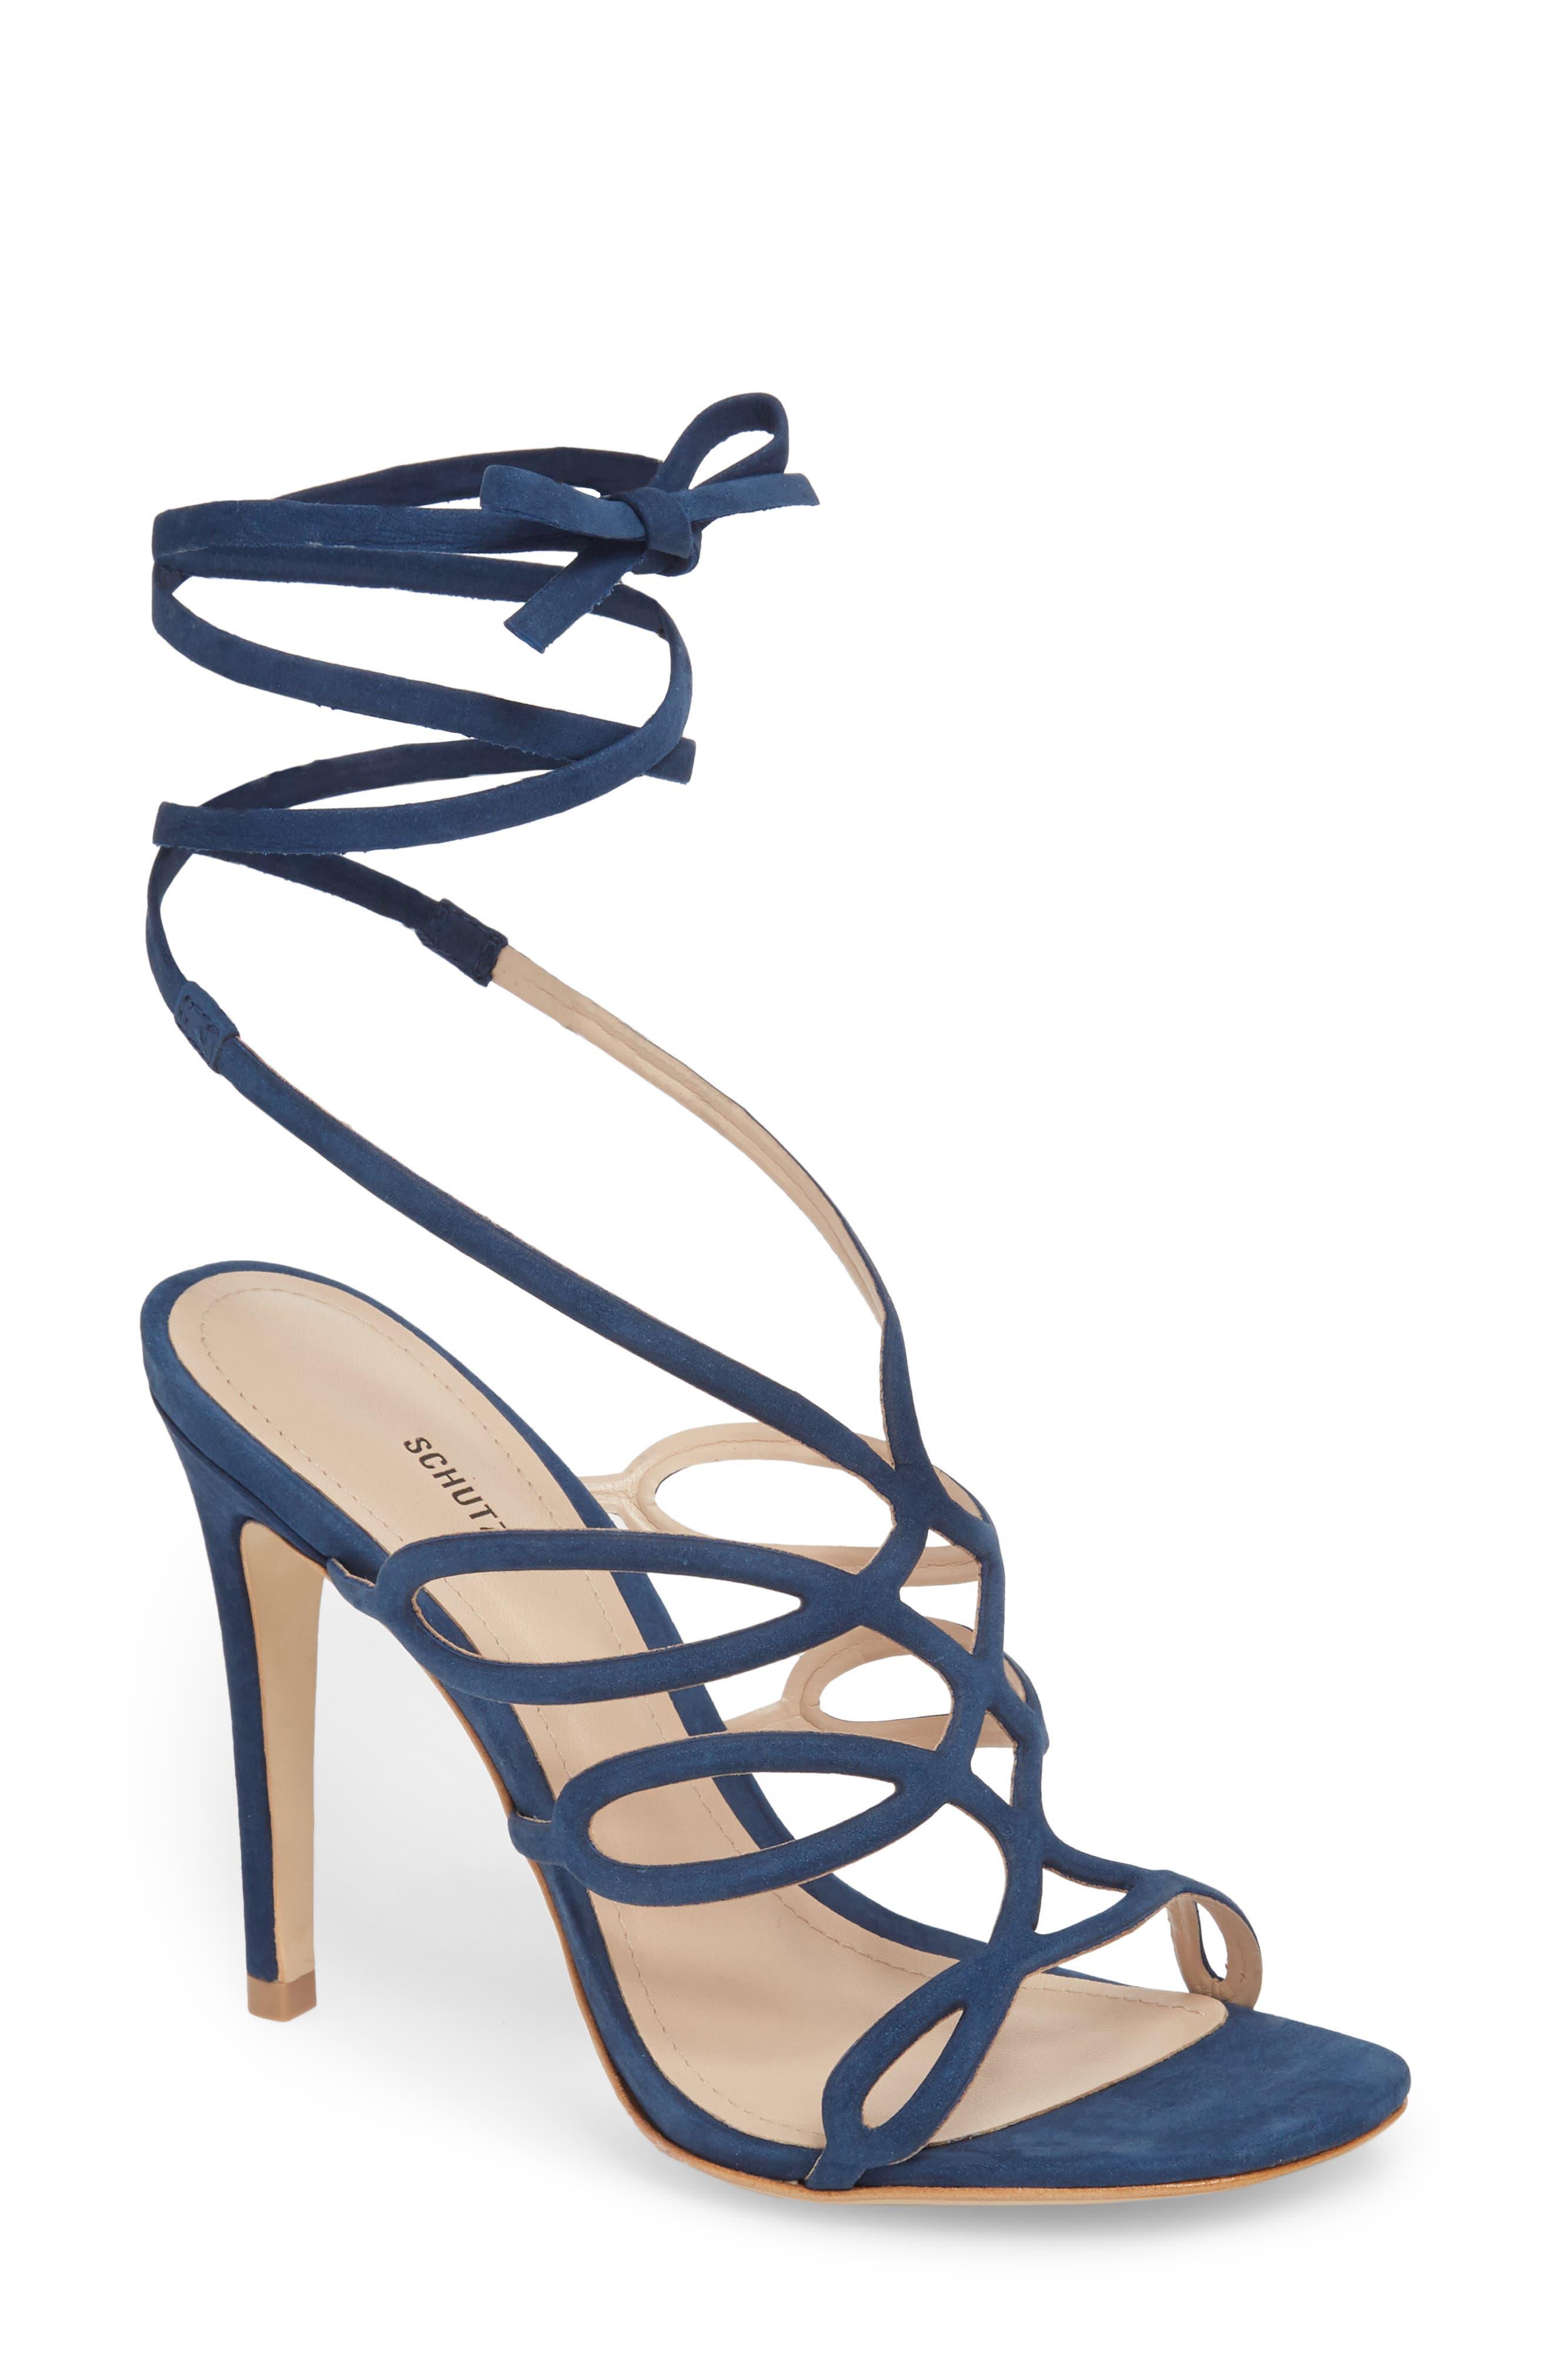 SCHUTZ Nivia Sandal, Main, color, 400